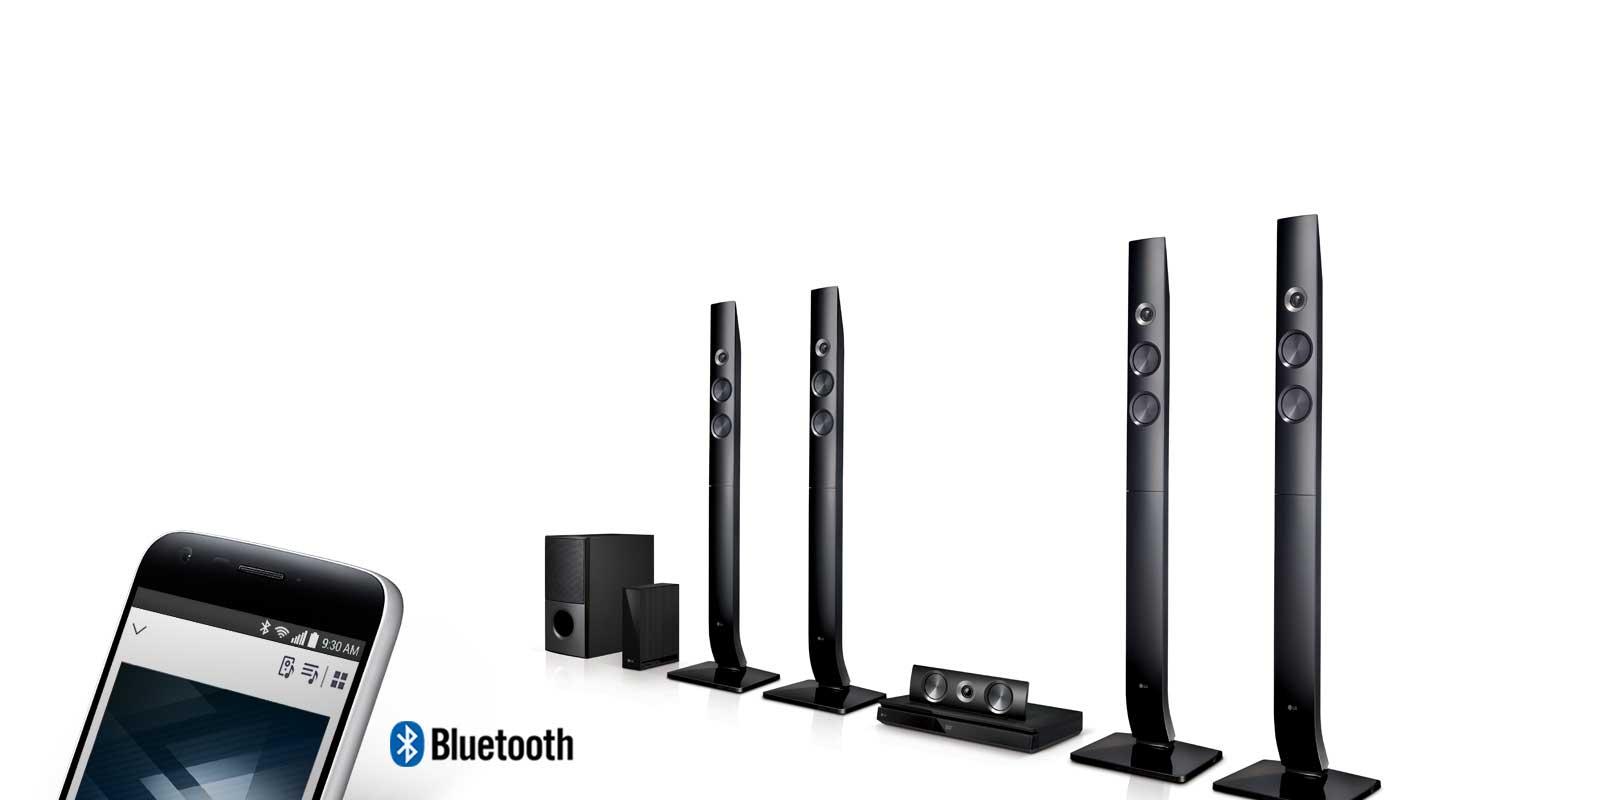 بلوتوث و جریان صوتی سینما خانگی الجی مدل LHD756W